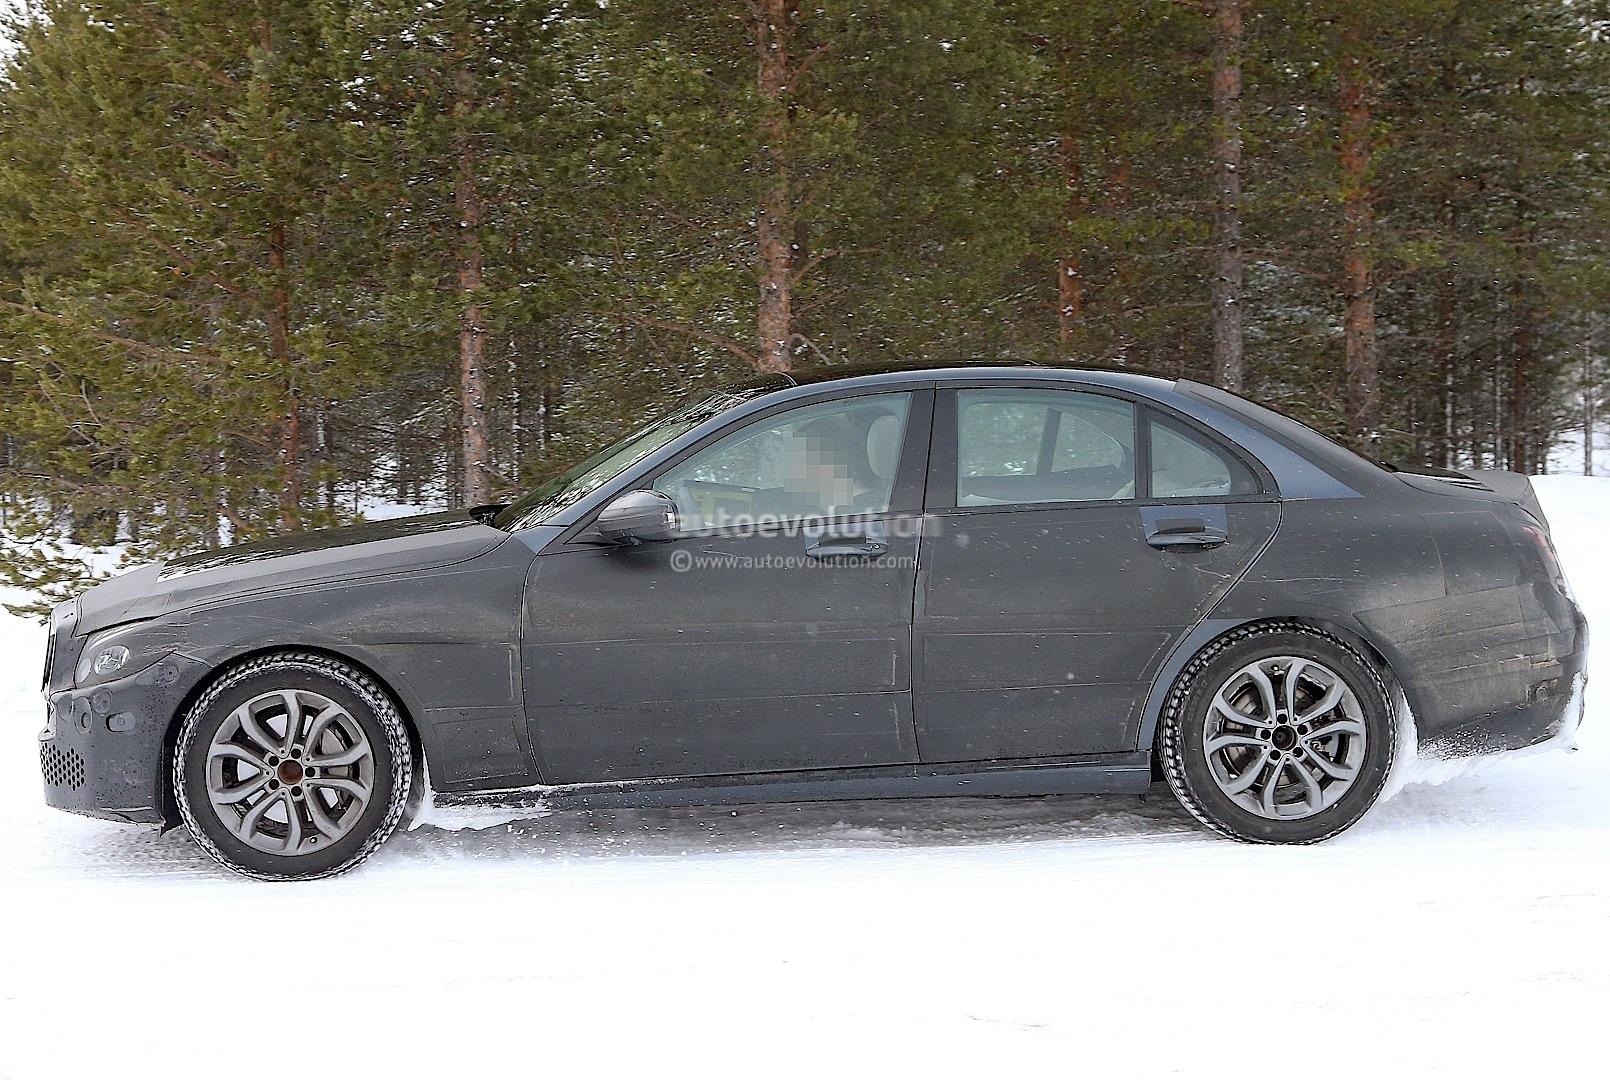 Spyshots: 2014 W205 Mercedes Benz C-Class Sheds Some Camo